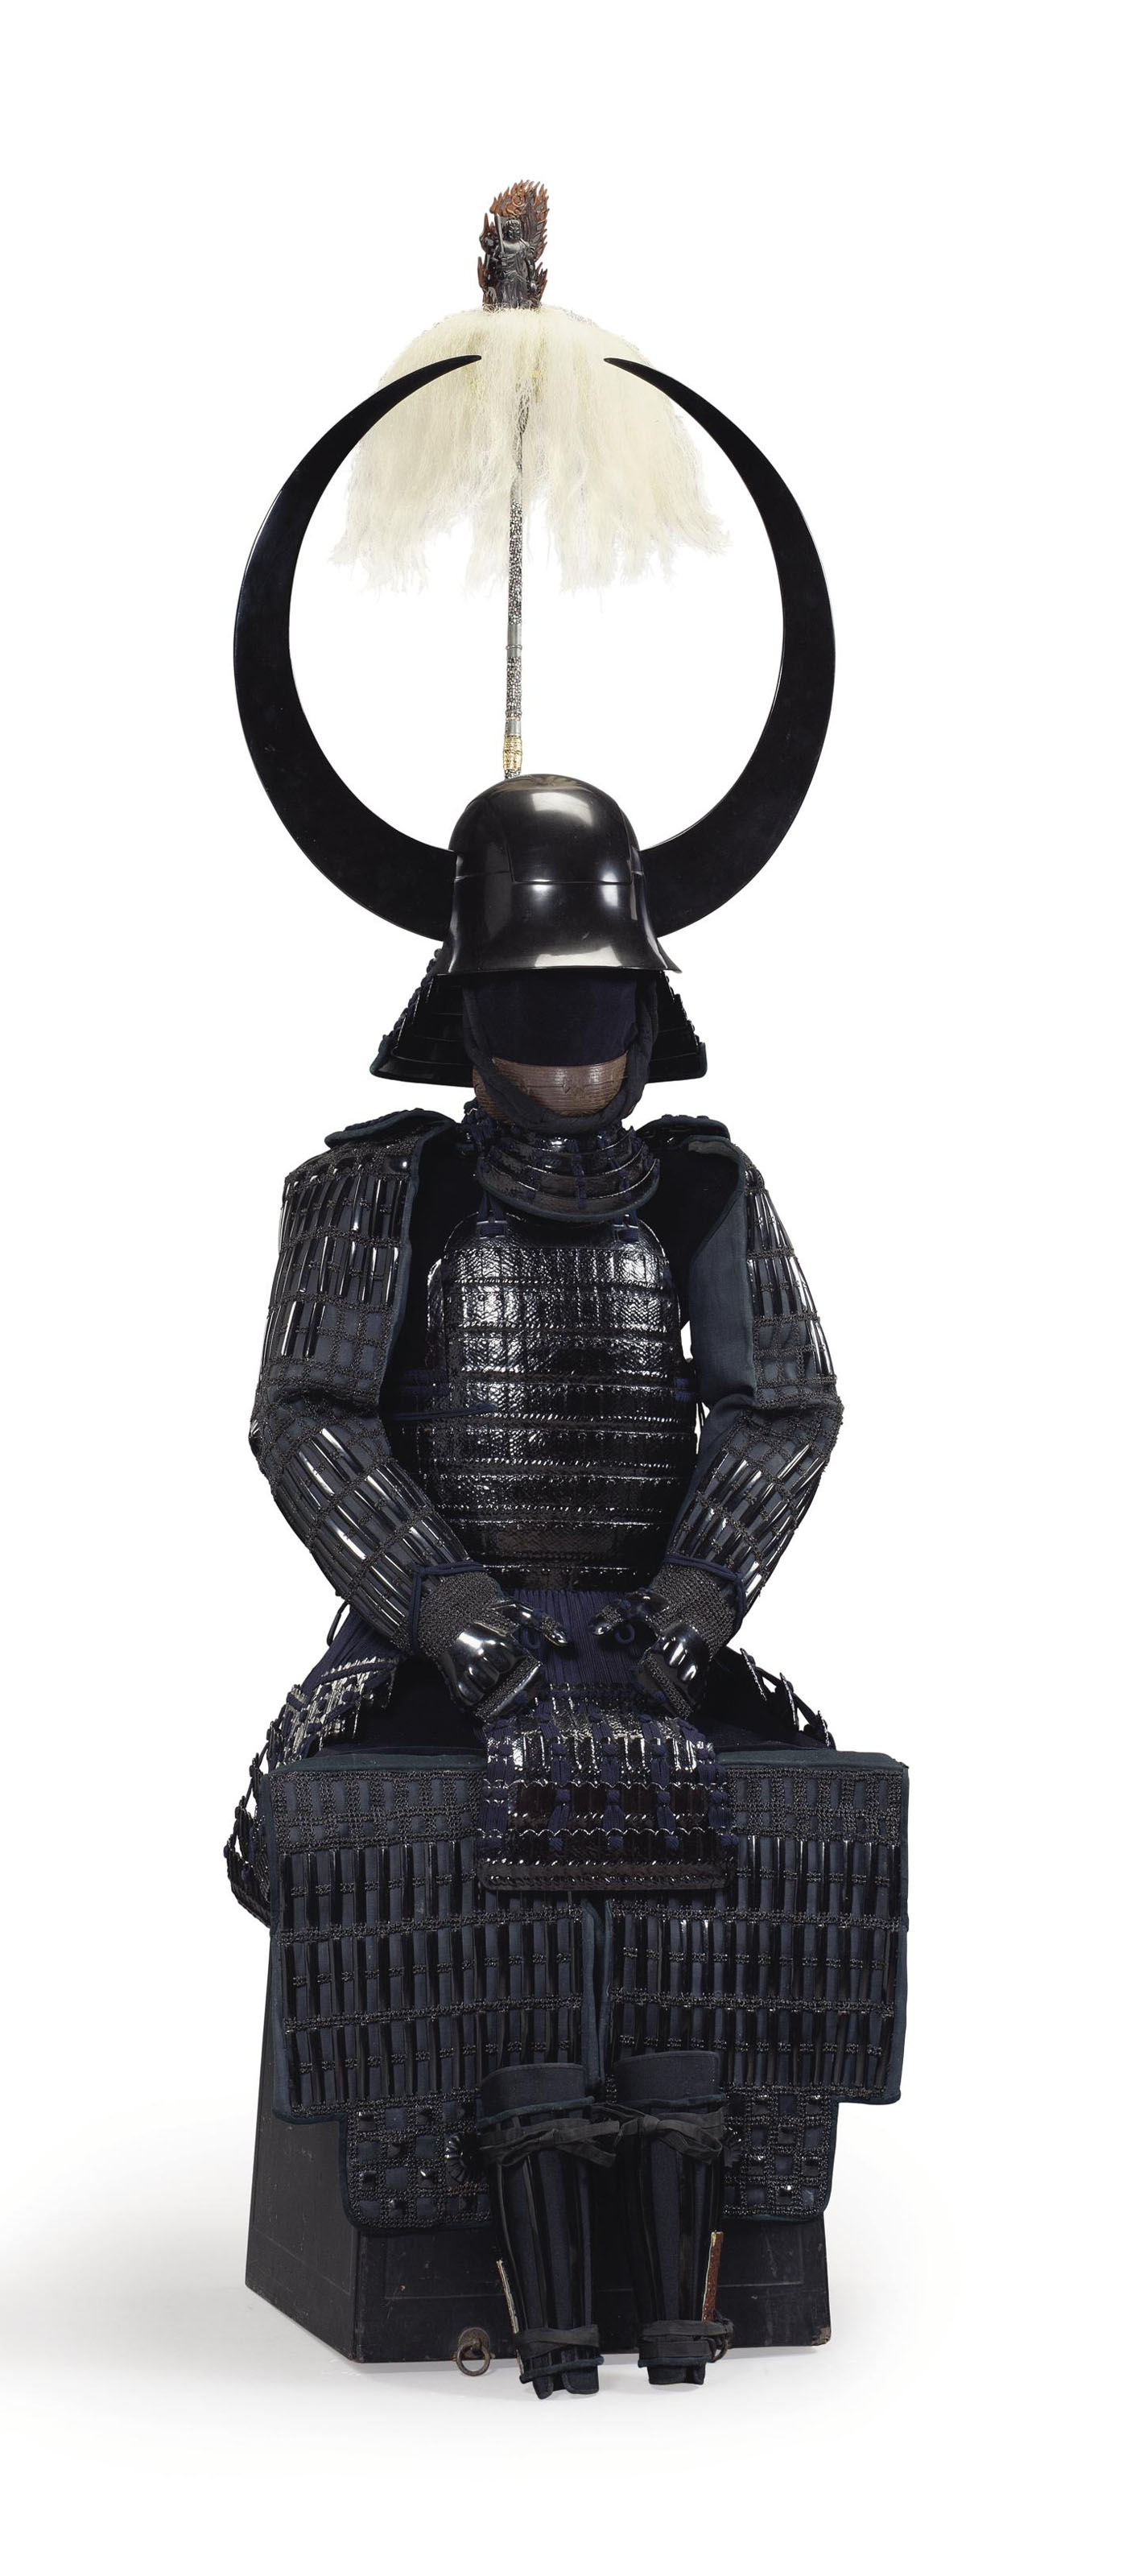 A black-laced Uname-nui Okegaw